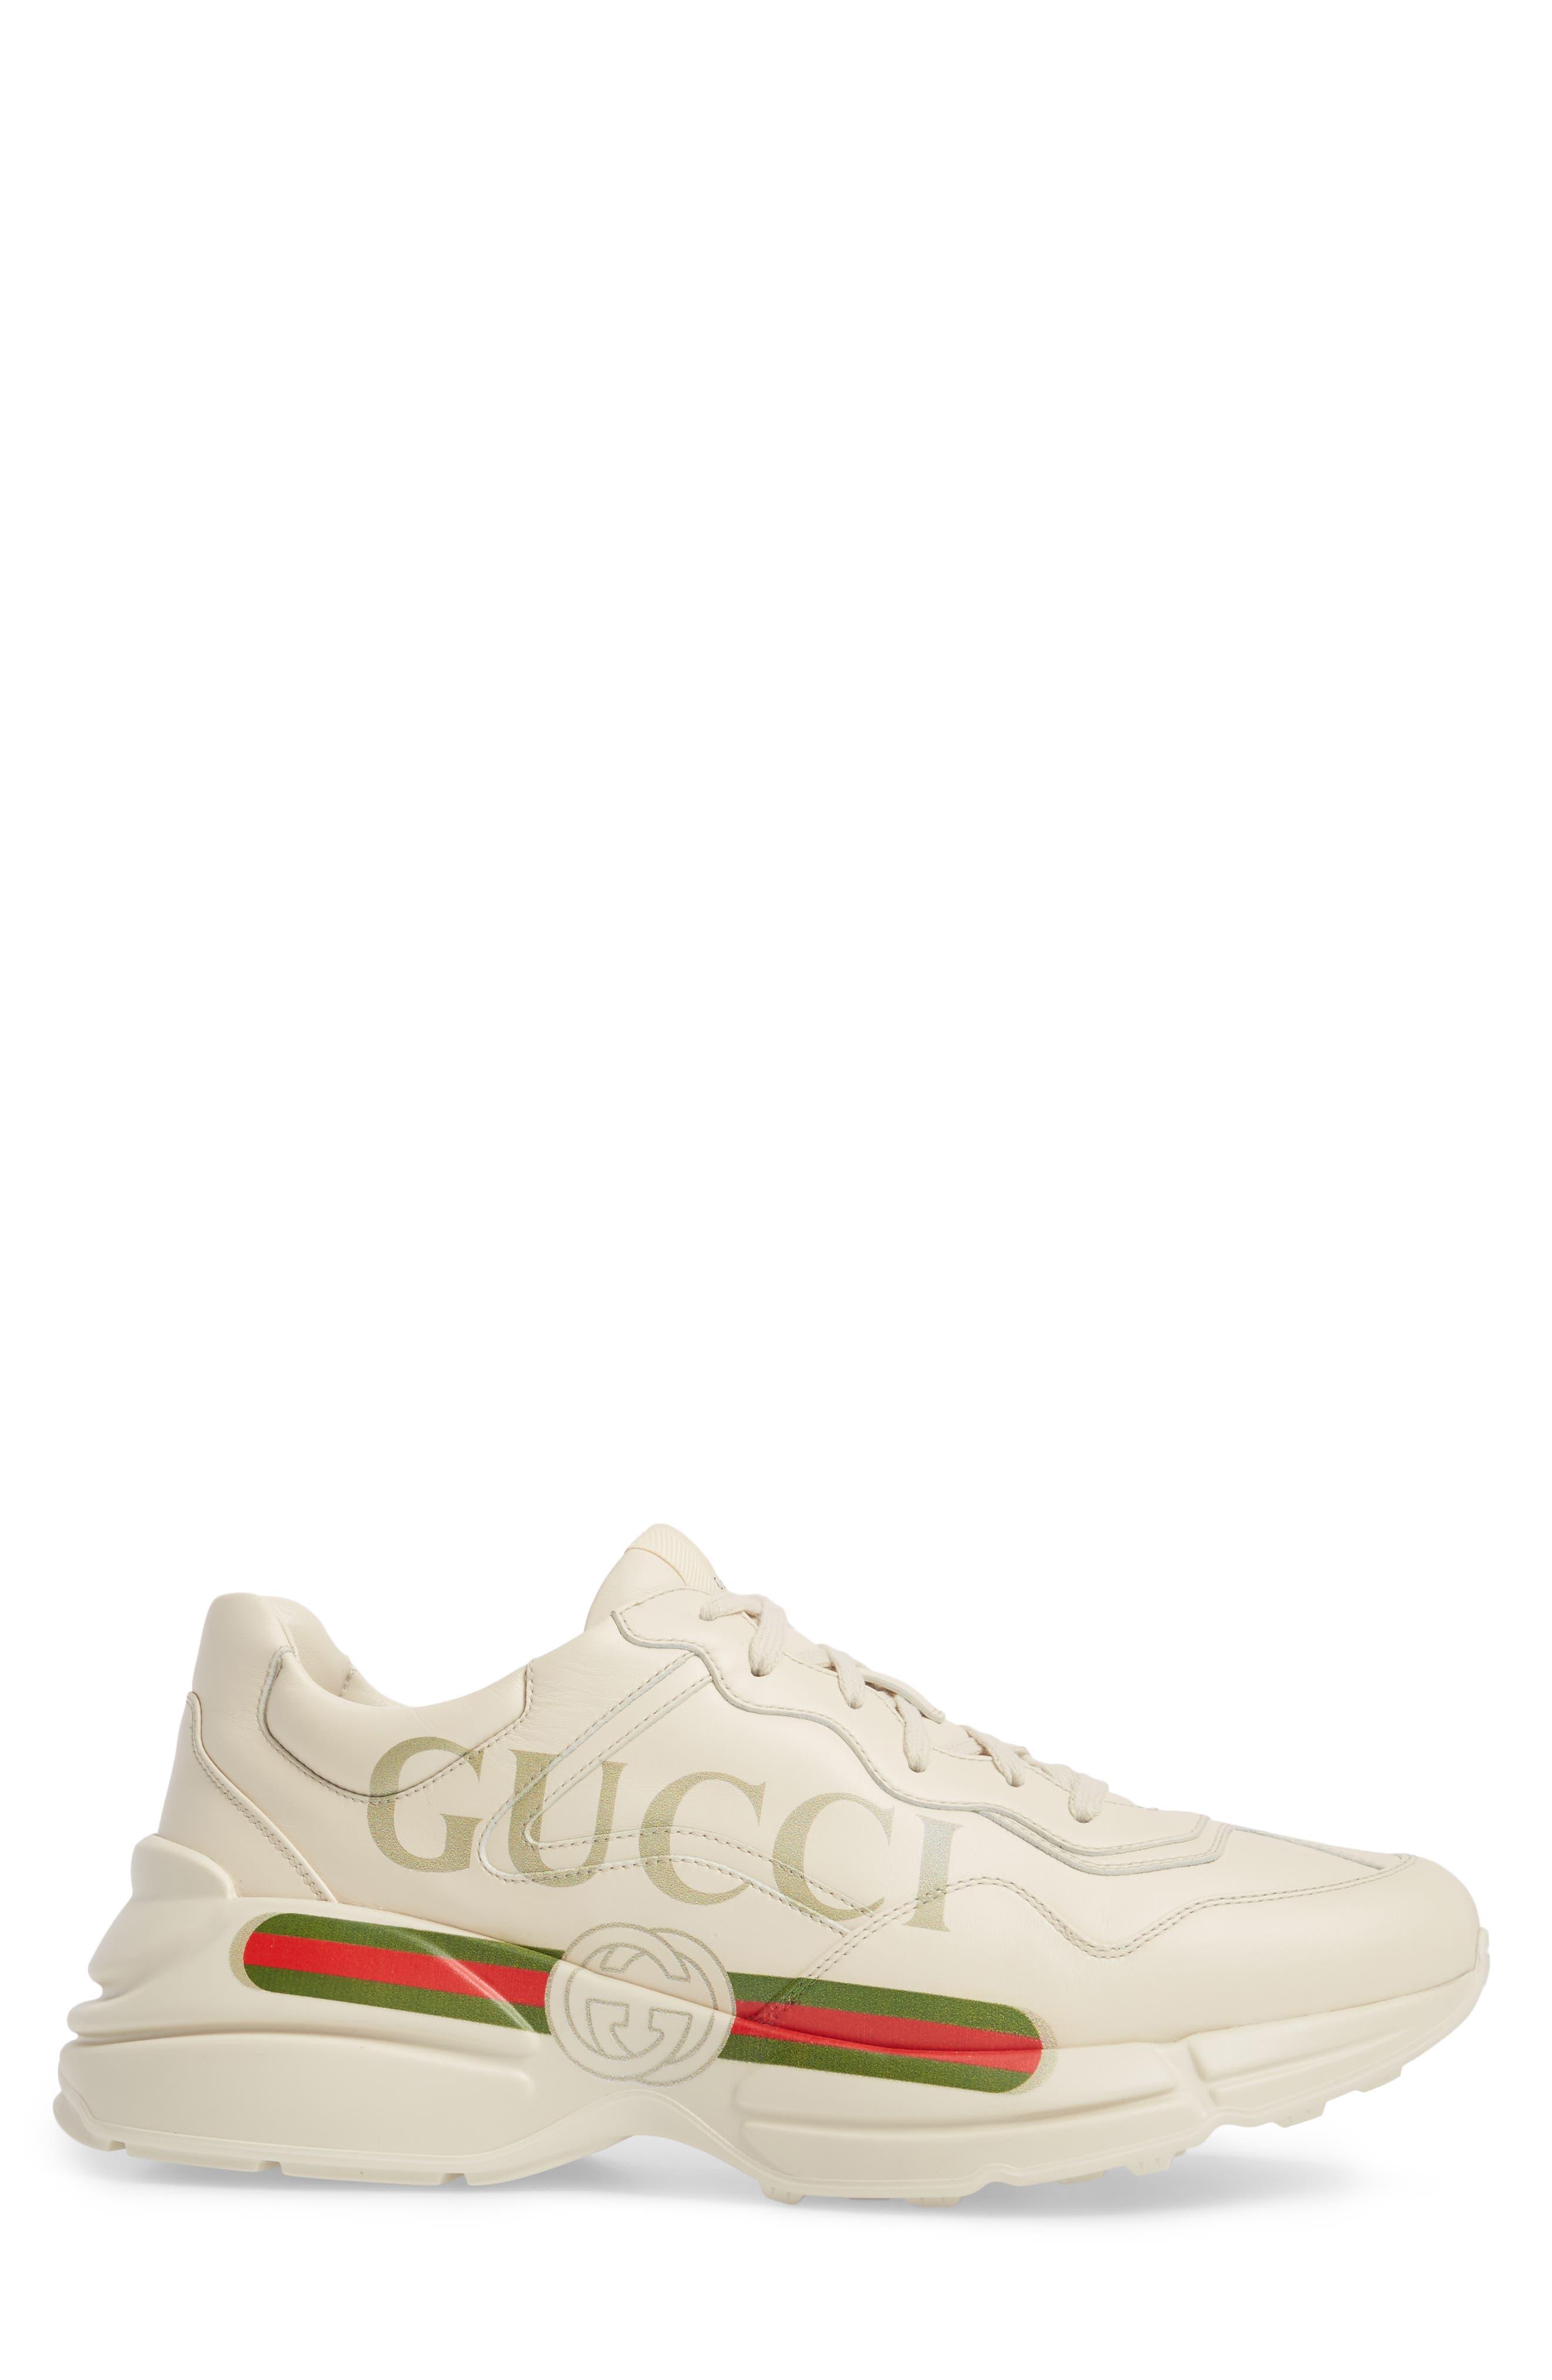 GUCCI, Logo Leather Sneaker, Alternate thumbnail 3, color, WHITE PRINT